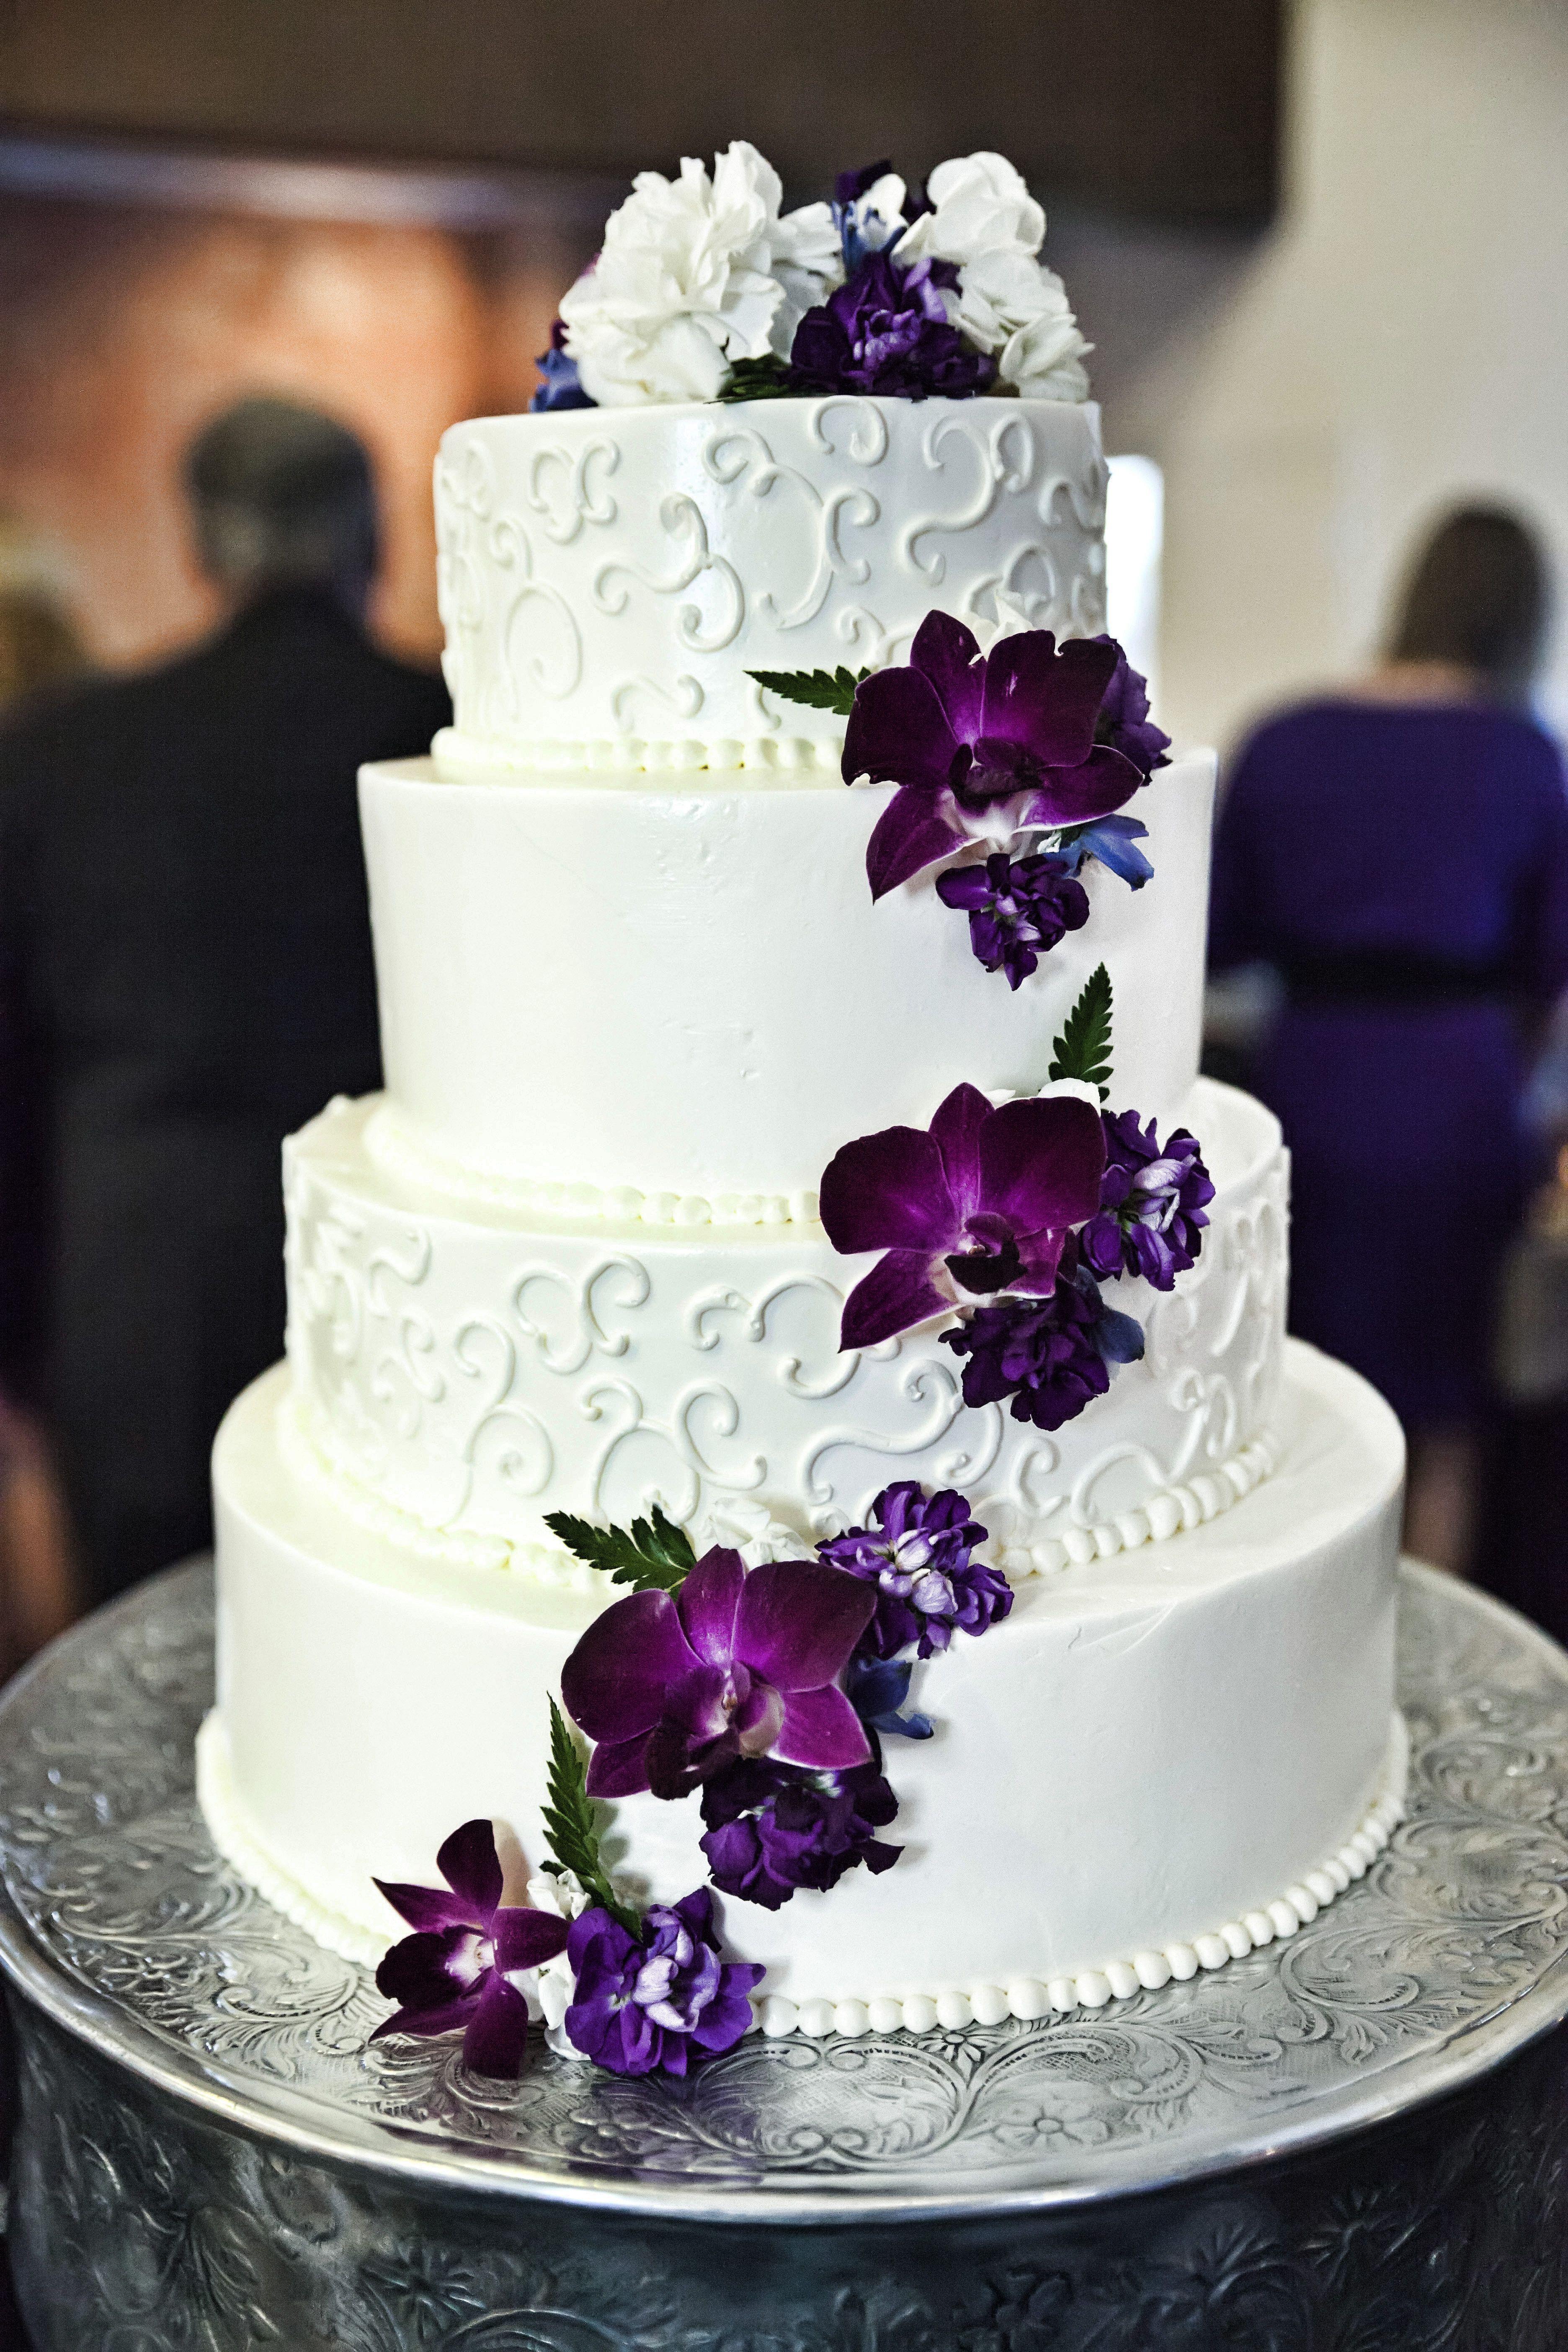 Wedding Cakes Purple Flowers  White and purple wedding cake with cascading purple